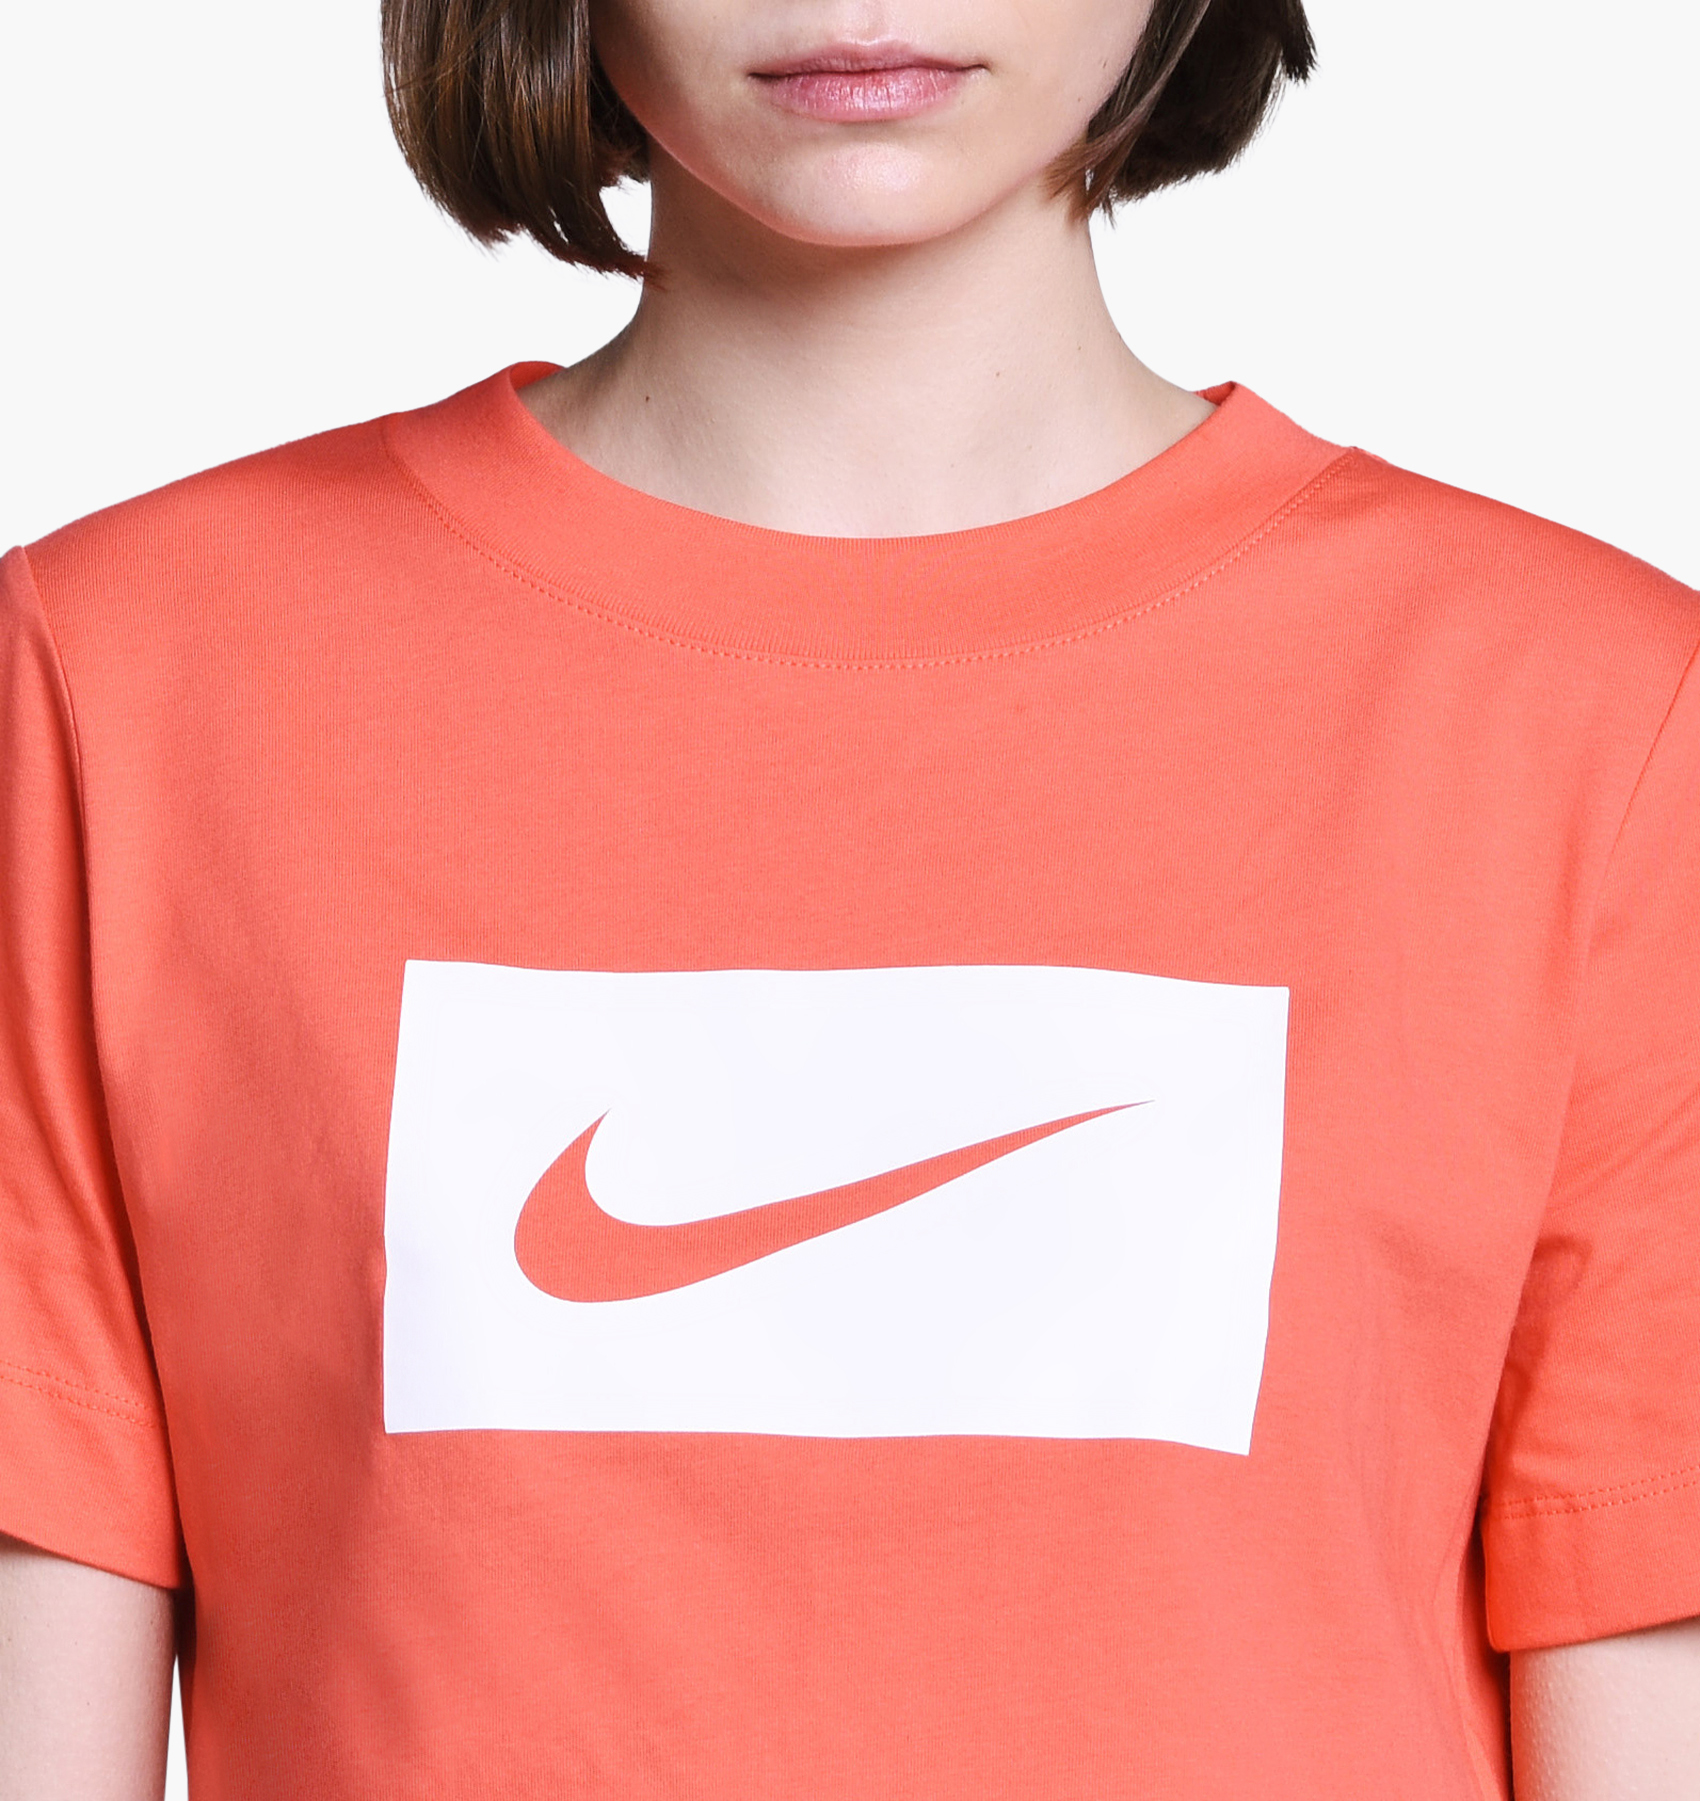 9f99807cf532de Nike Wmns NSW Swoosh Cropped Tee - SPORTING GOODS Sports Shirts ...